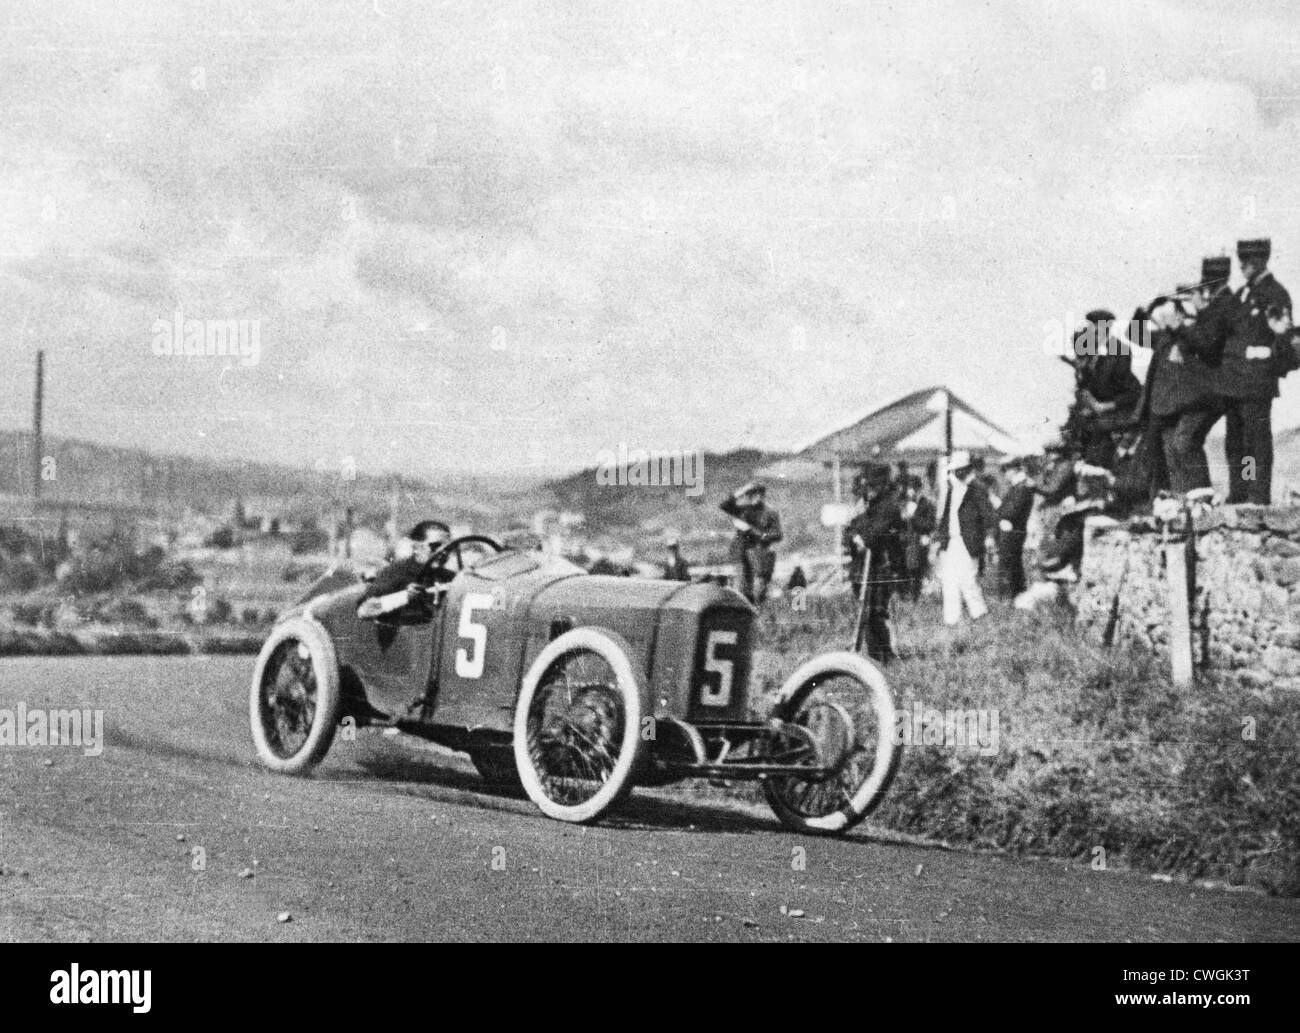 1914 Peugeot, French Grand Prix. G. Boillot - Stock Image